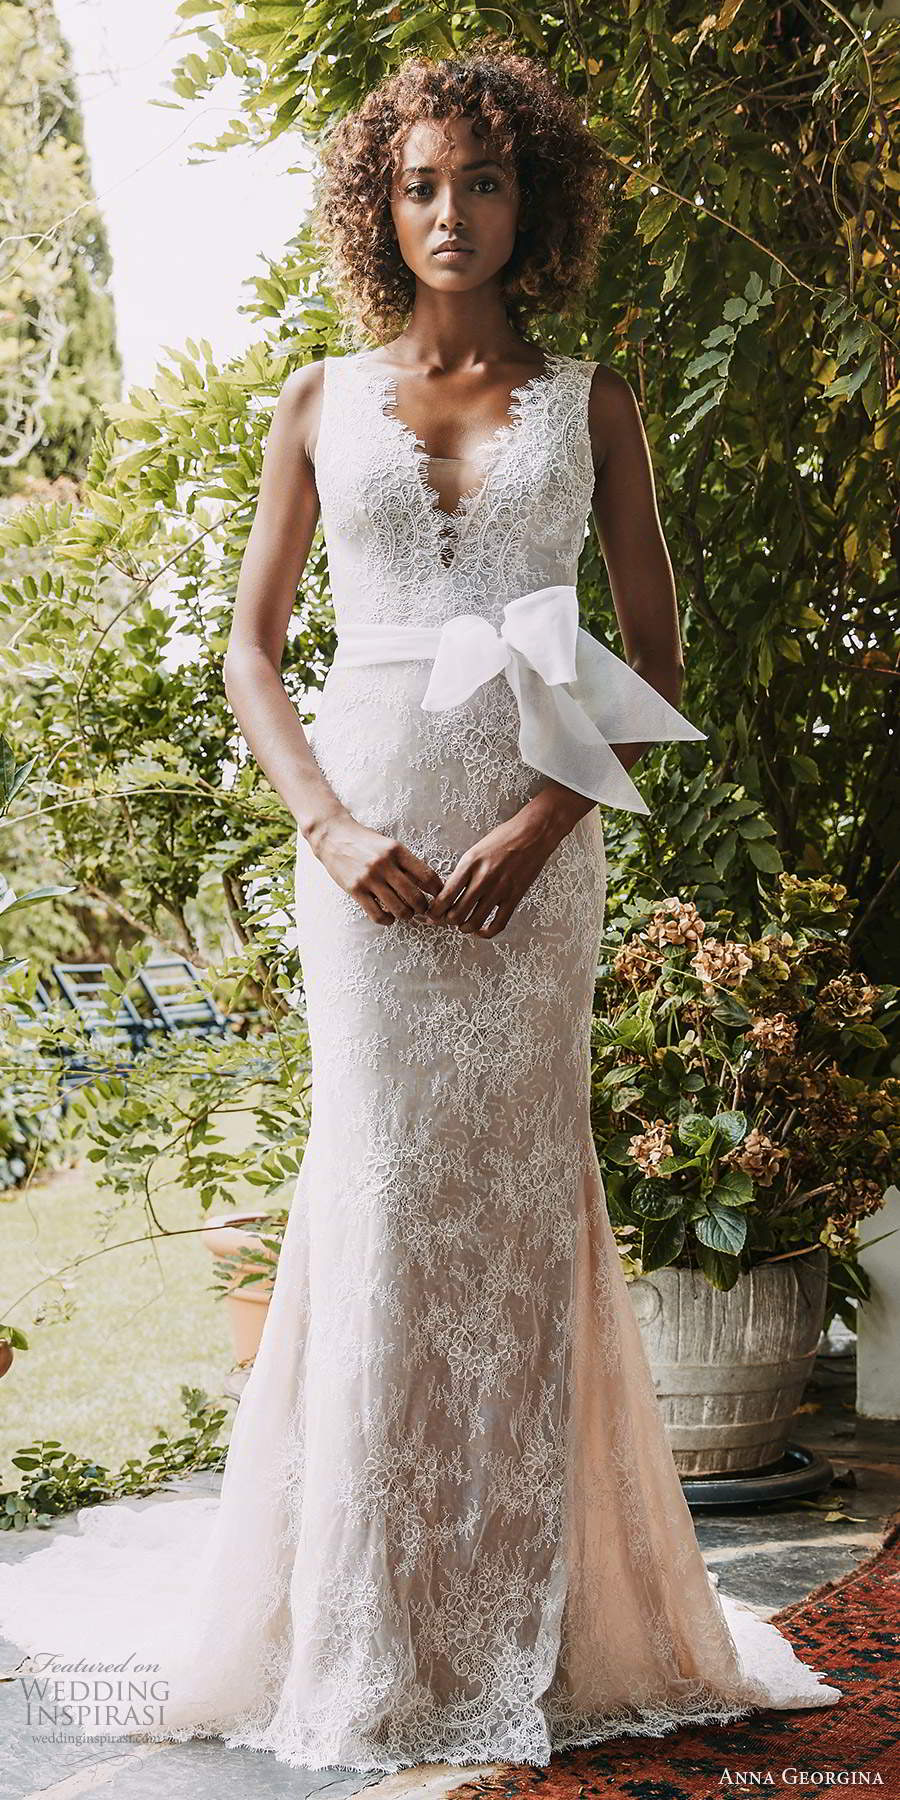 anna georgina 2021 bridal romance sleeveless thick straps v neckline embellished lace sheath wedding dress v back chapel train (6) mv